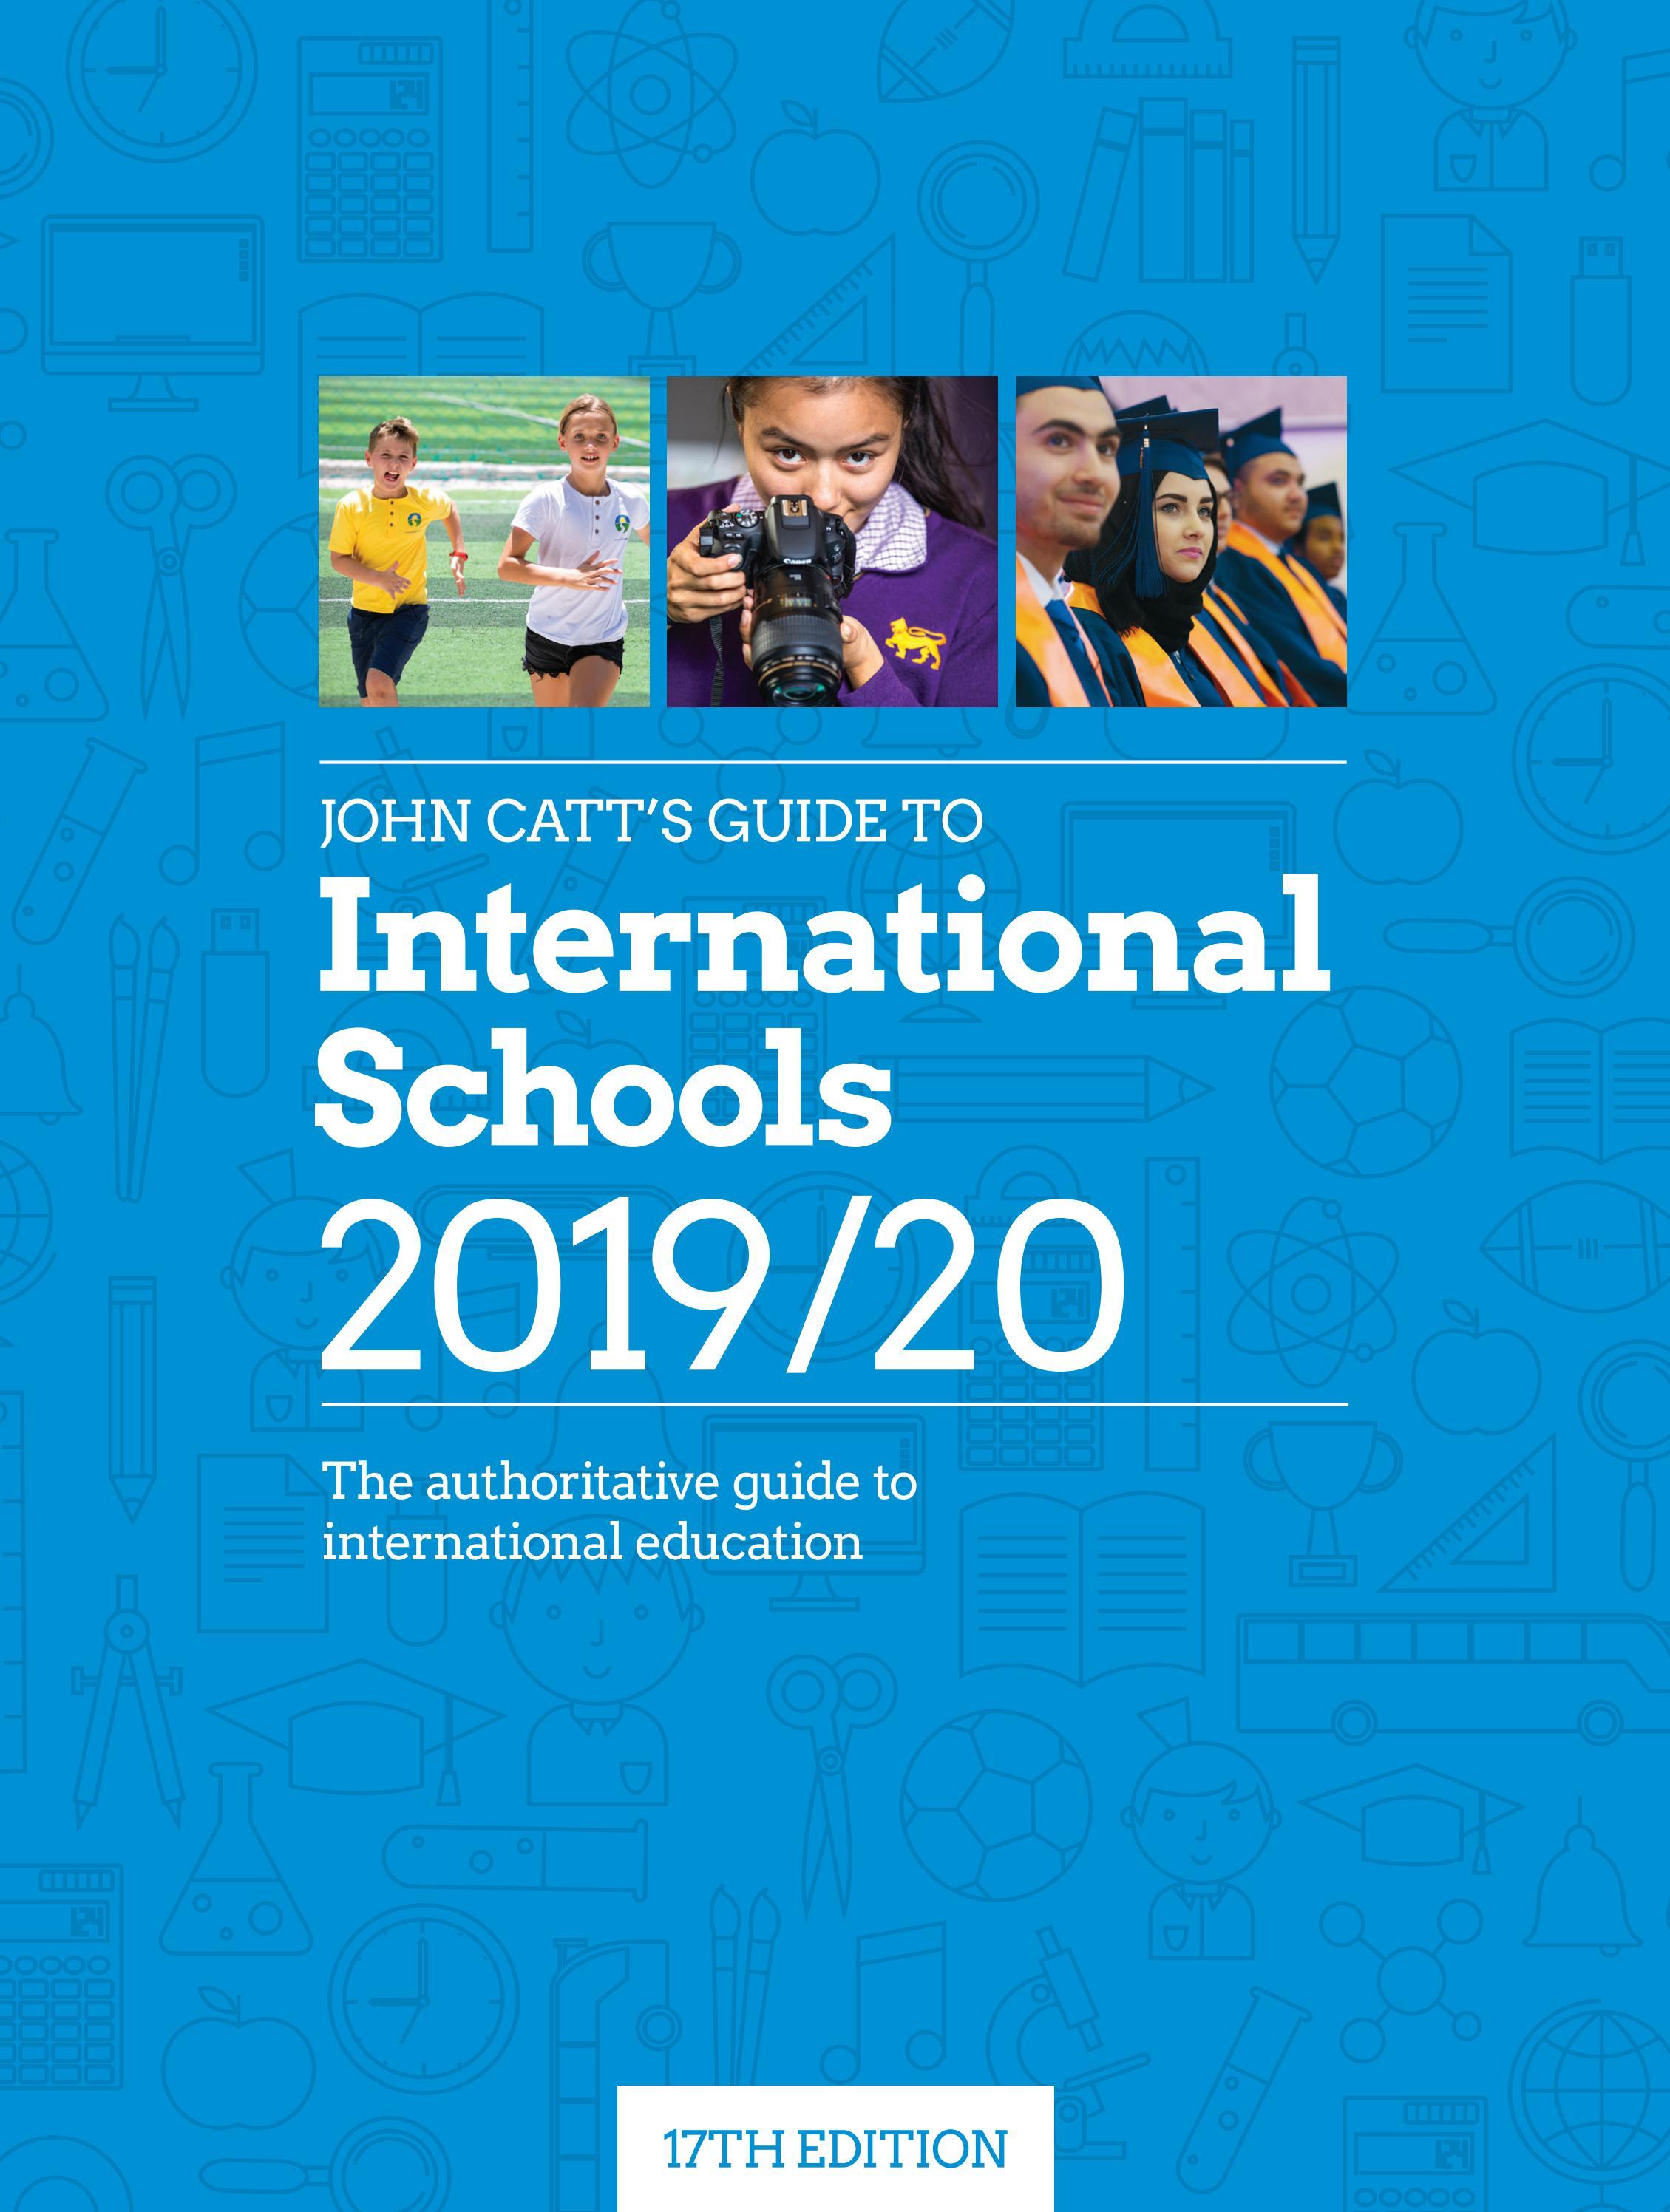 John Catt S Guide To International Schools 2019 20 By John